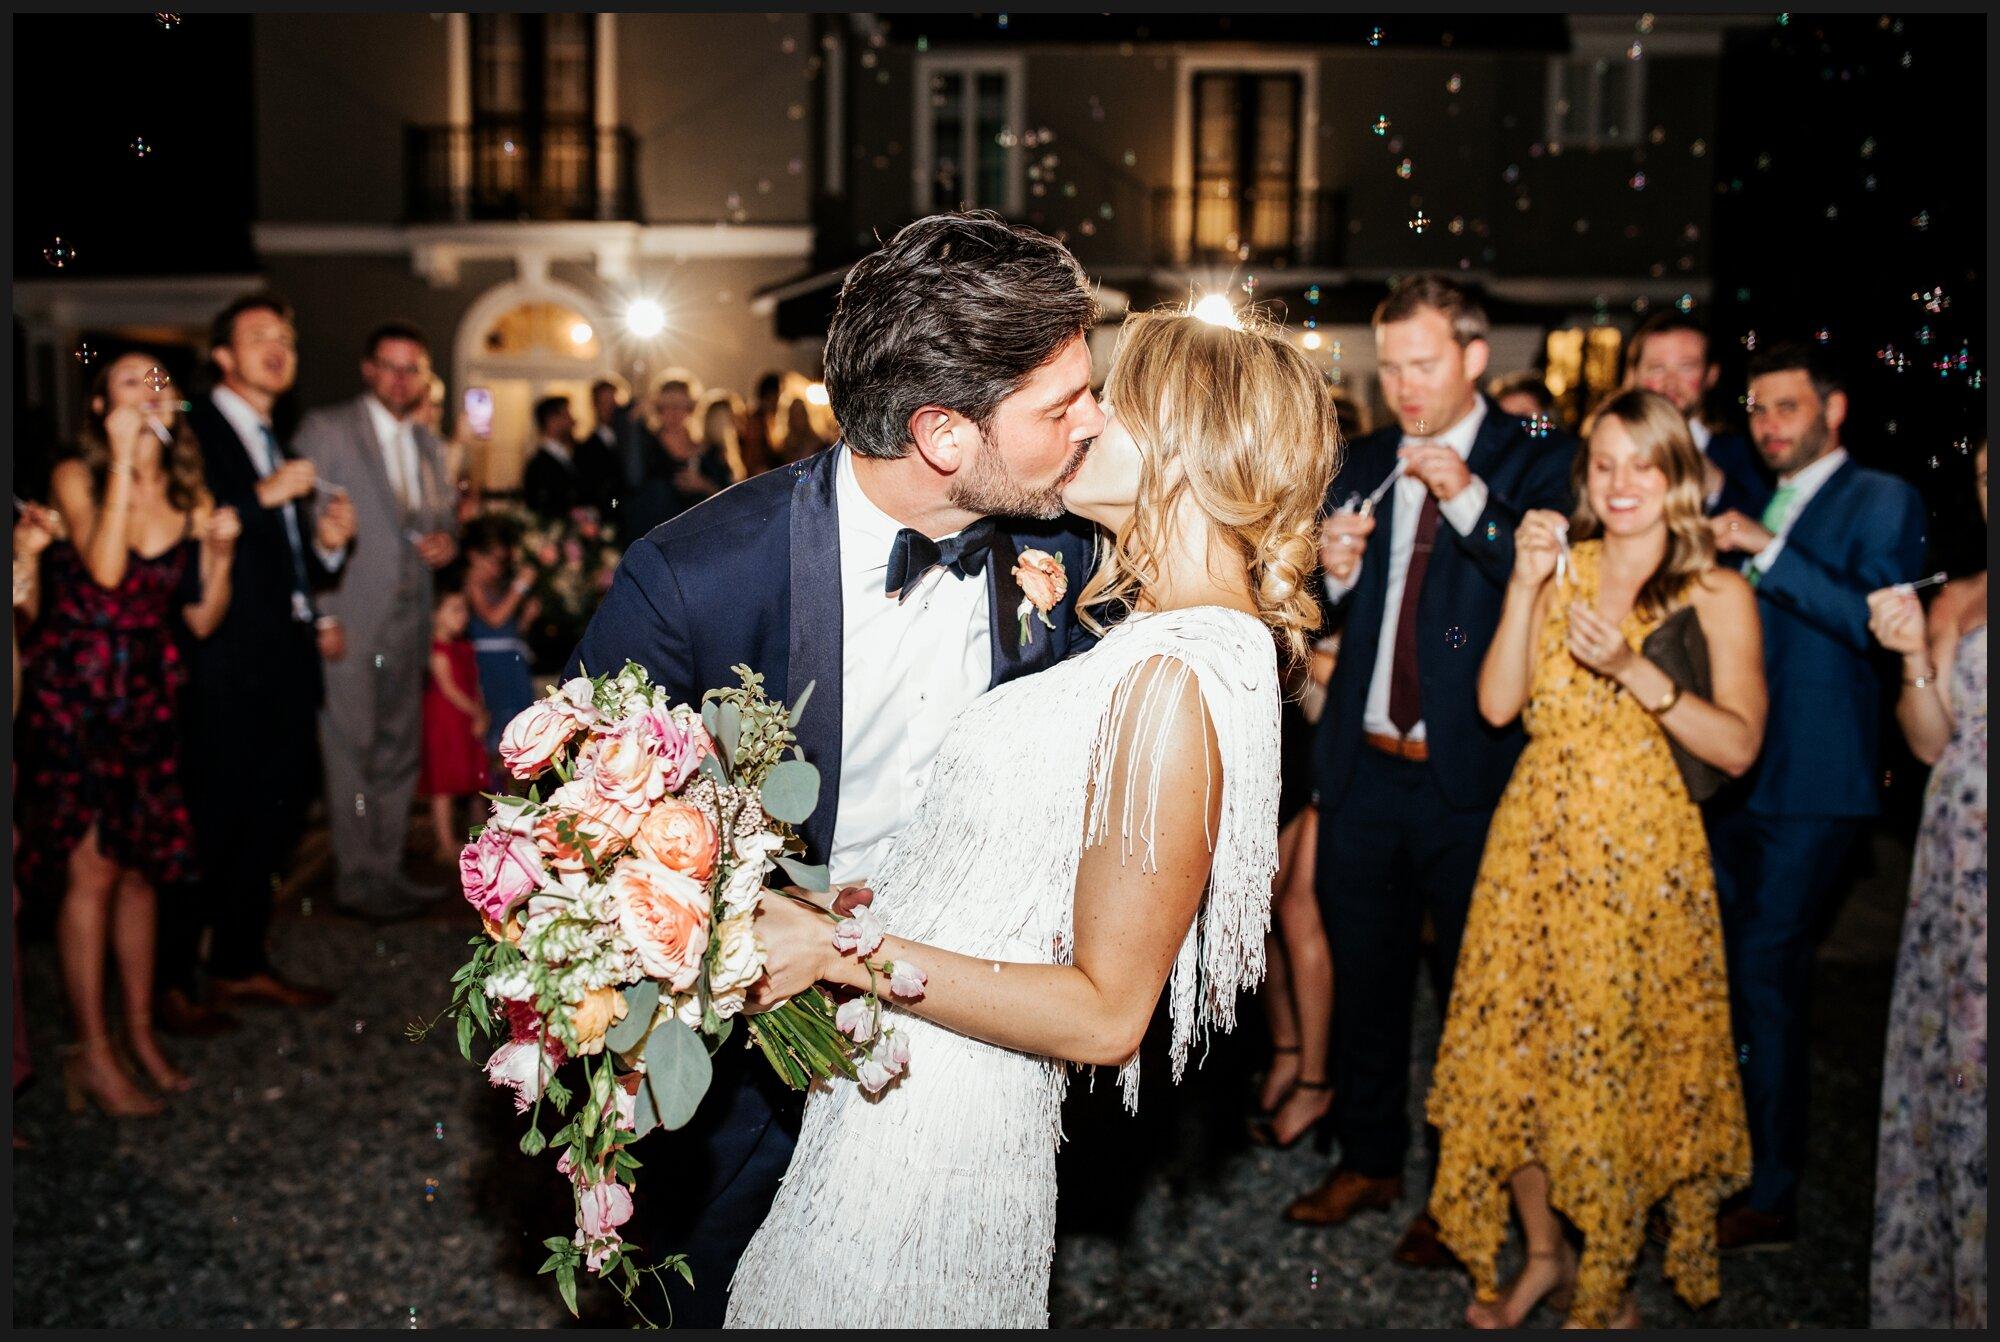 Orlando-Wedding-Photographer-destination-wedding-photographer-florida-wedding-photographer-hawaii-wedding-photographer_0772.jpg